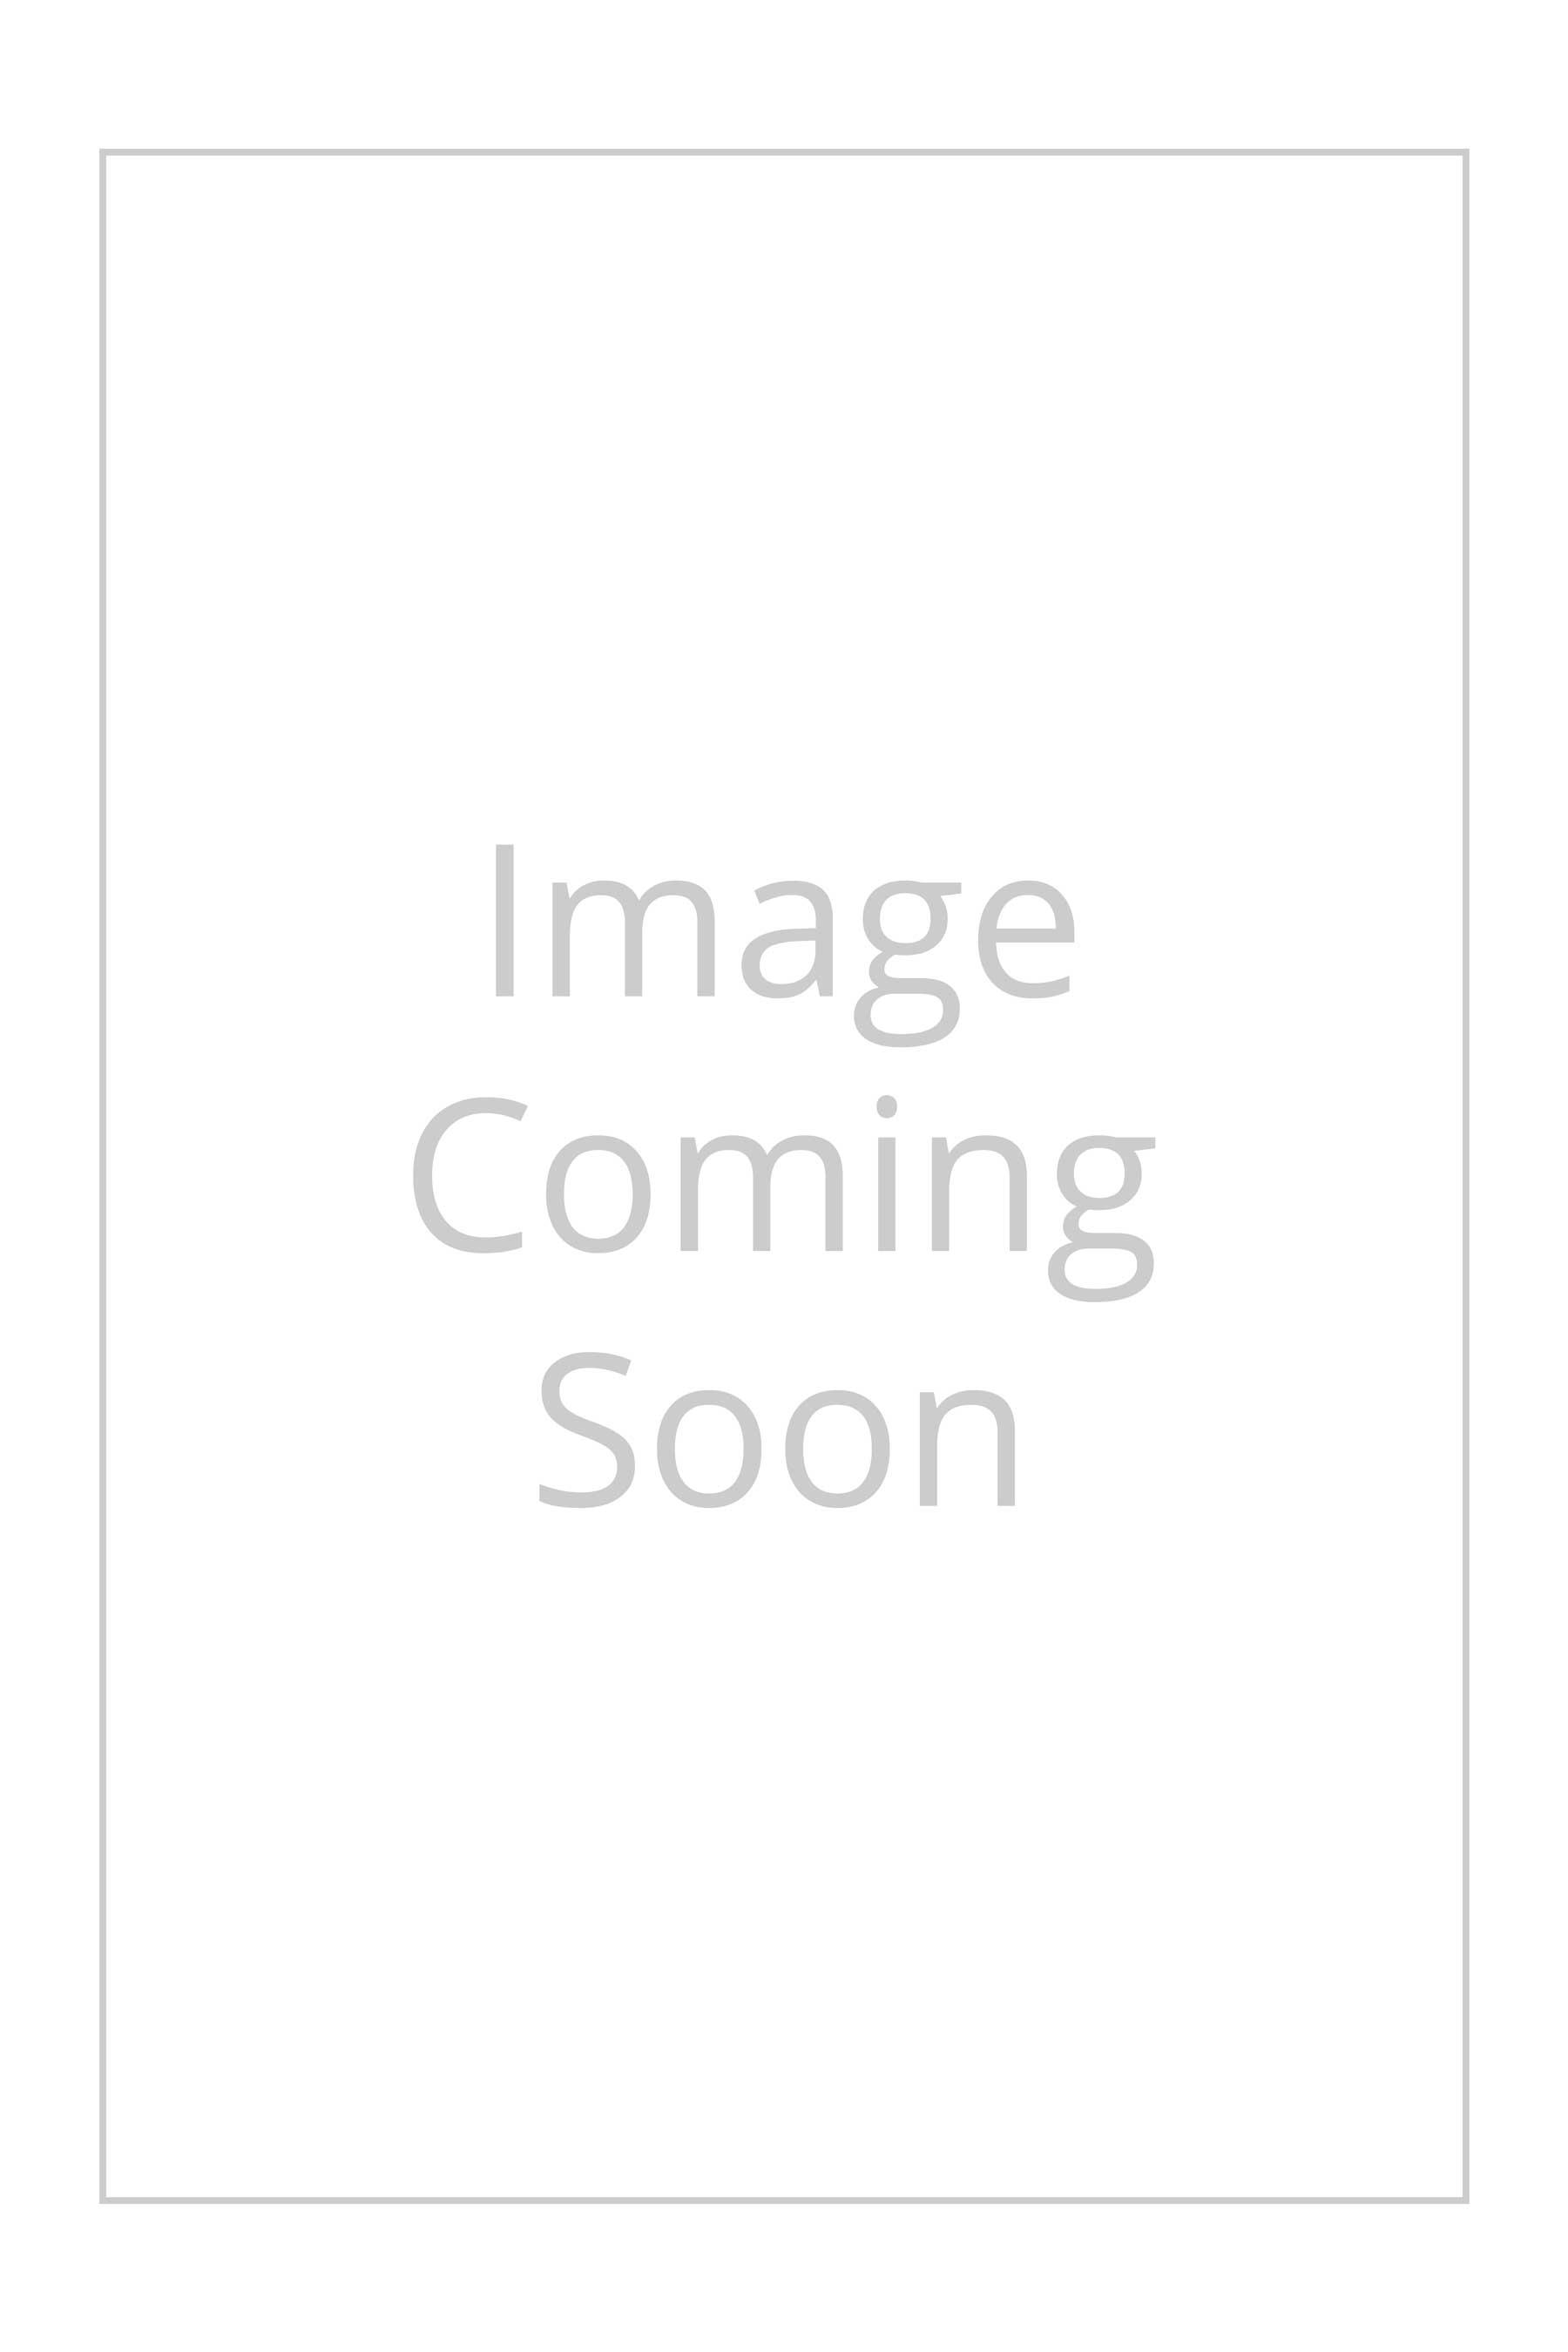 St John Evening Brown Santana Knit Jacket & Skirt Suit w/ Crystals